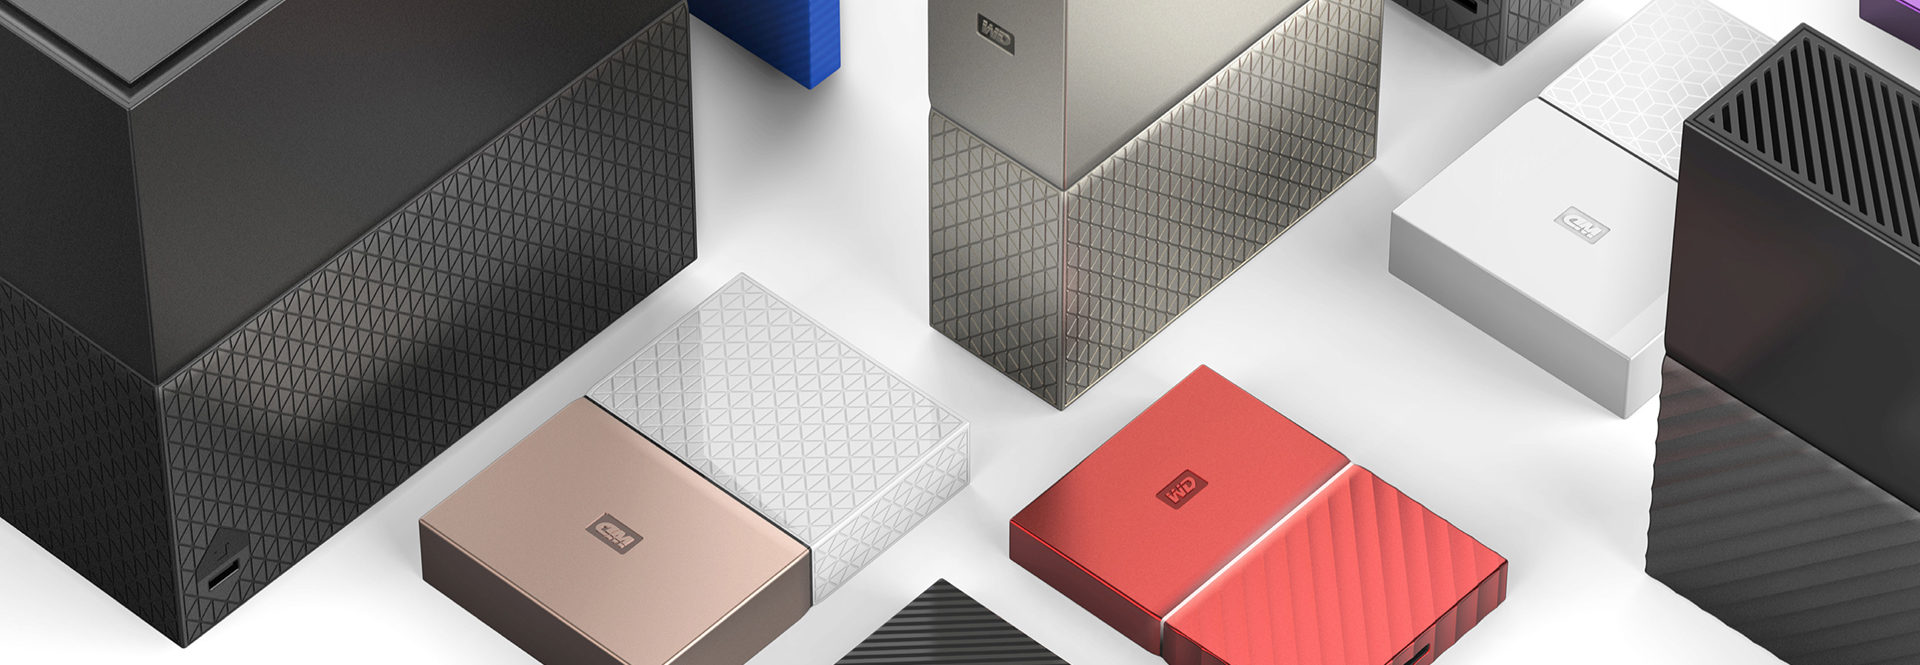 Range of Western Digital hard drive products